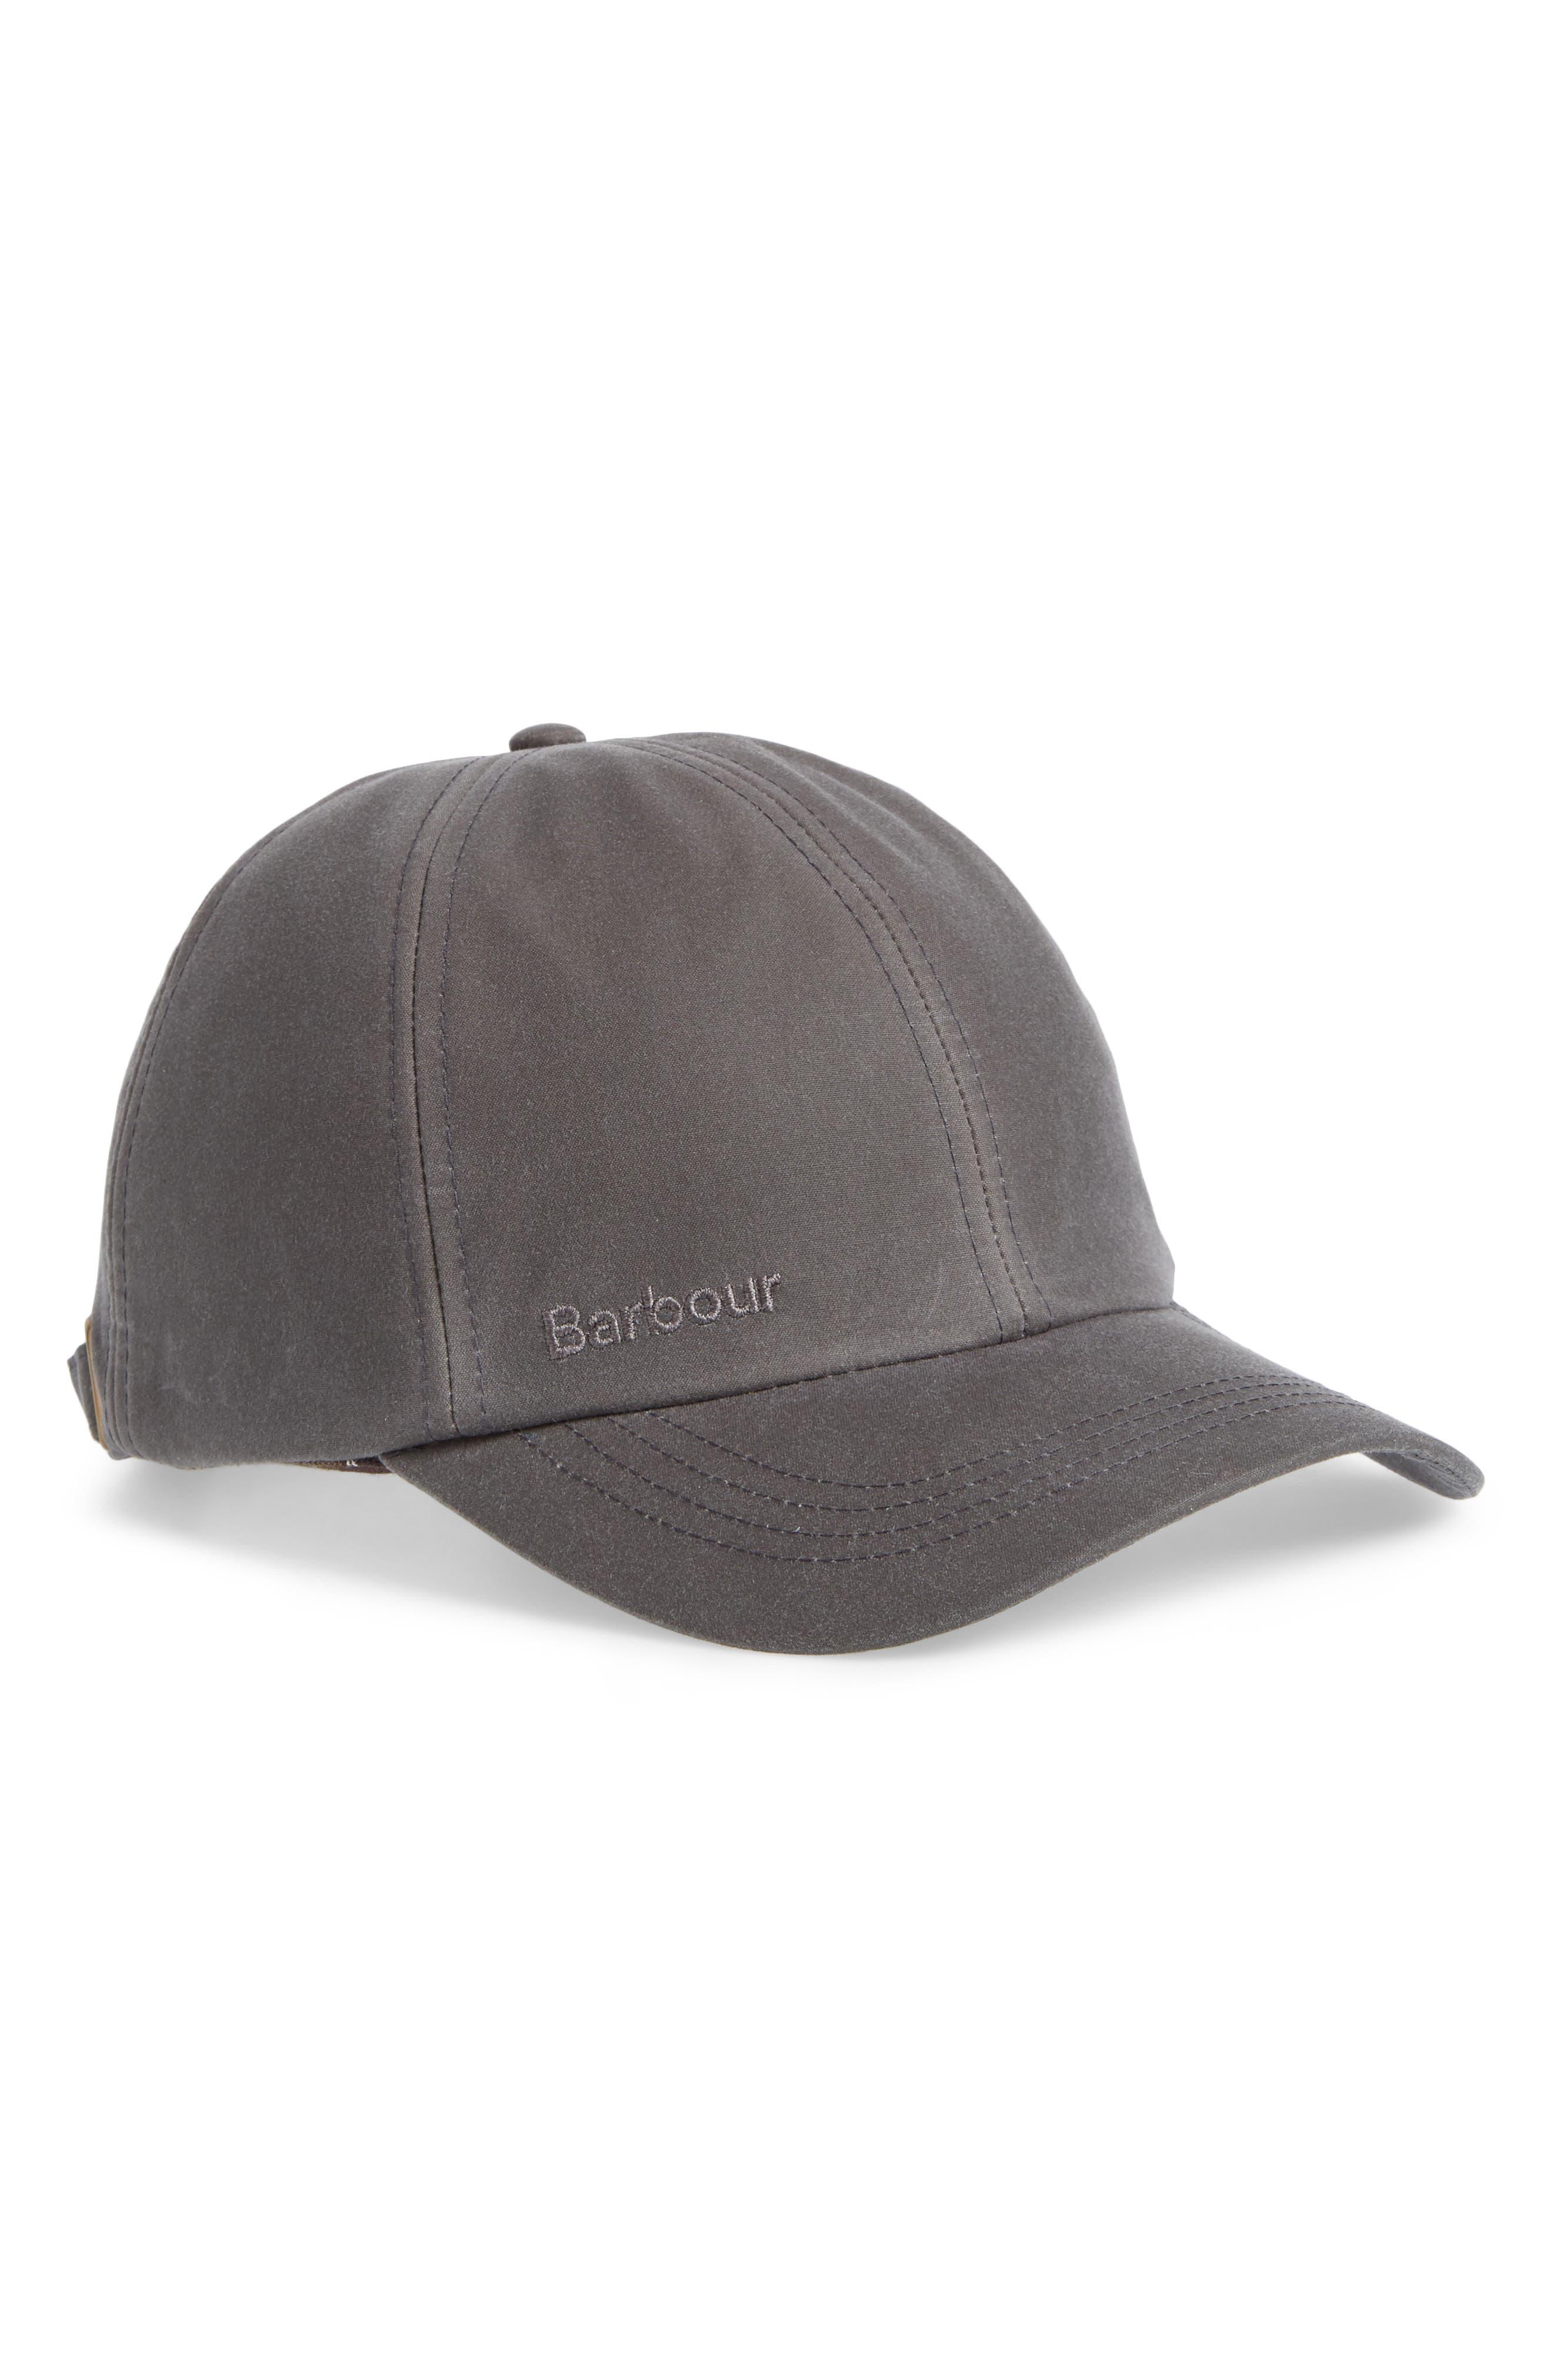 Prestbury Baseball Cap,                         Main,                         color, 020